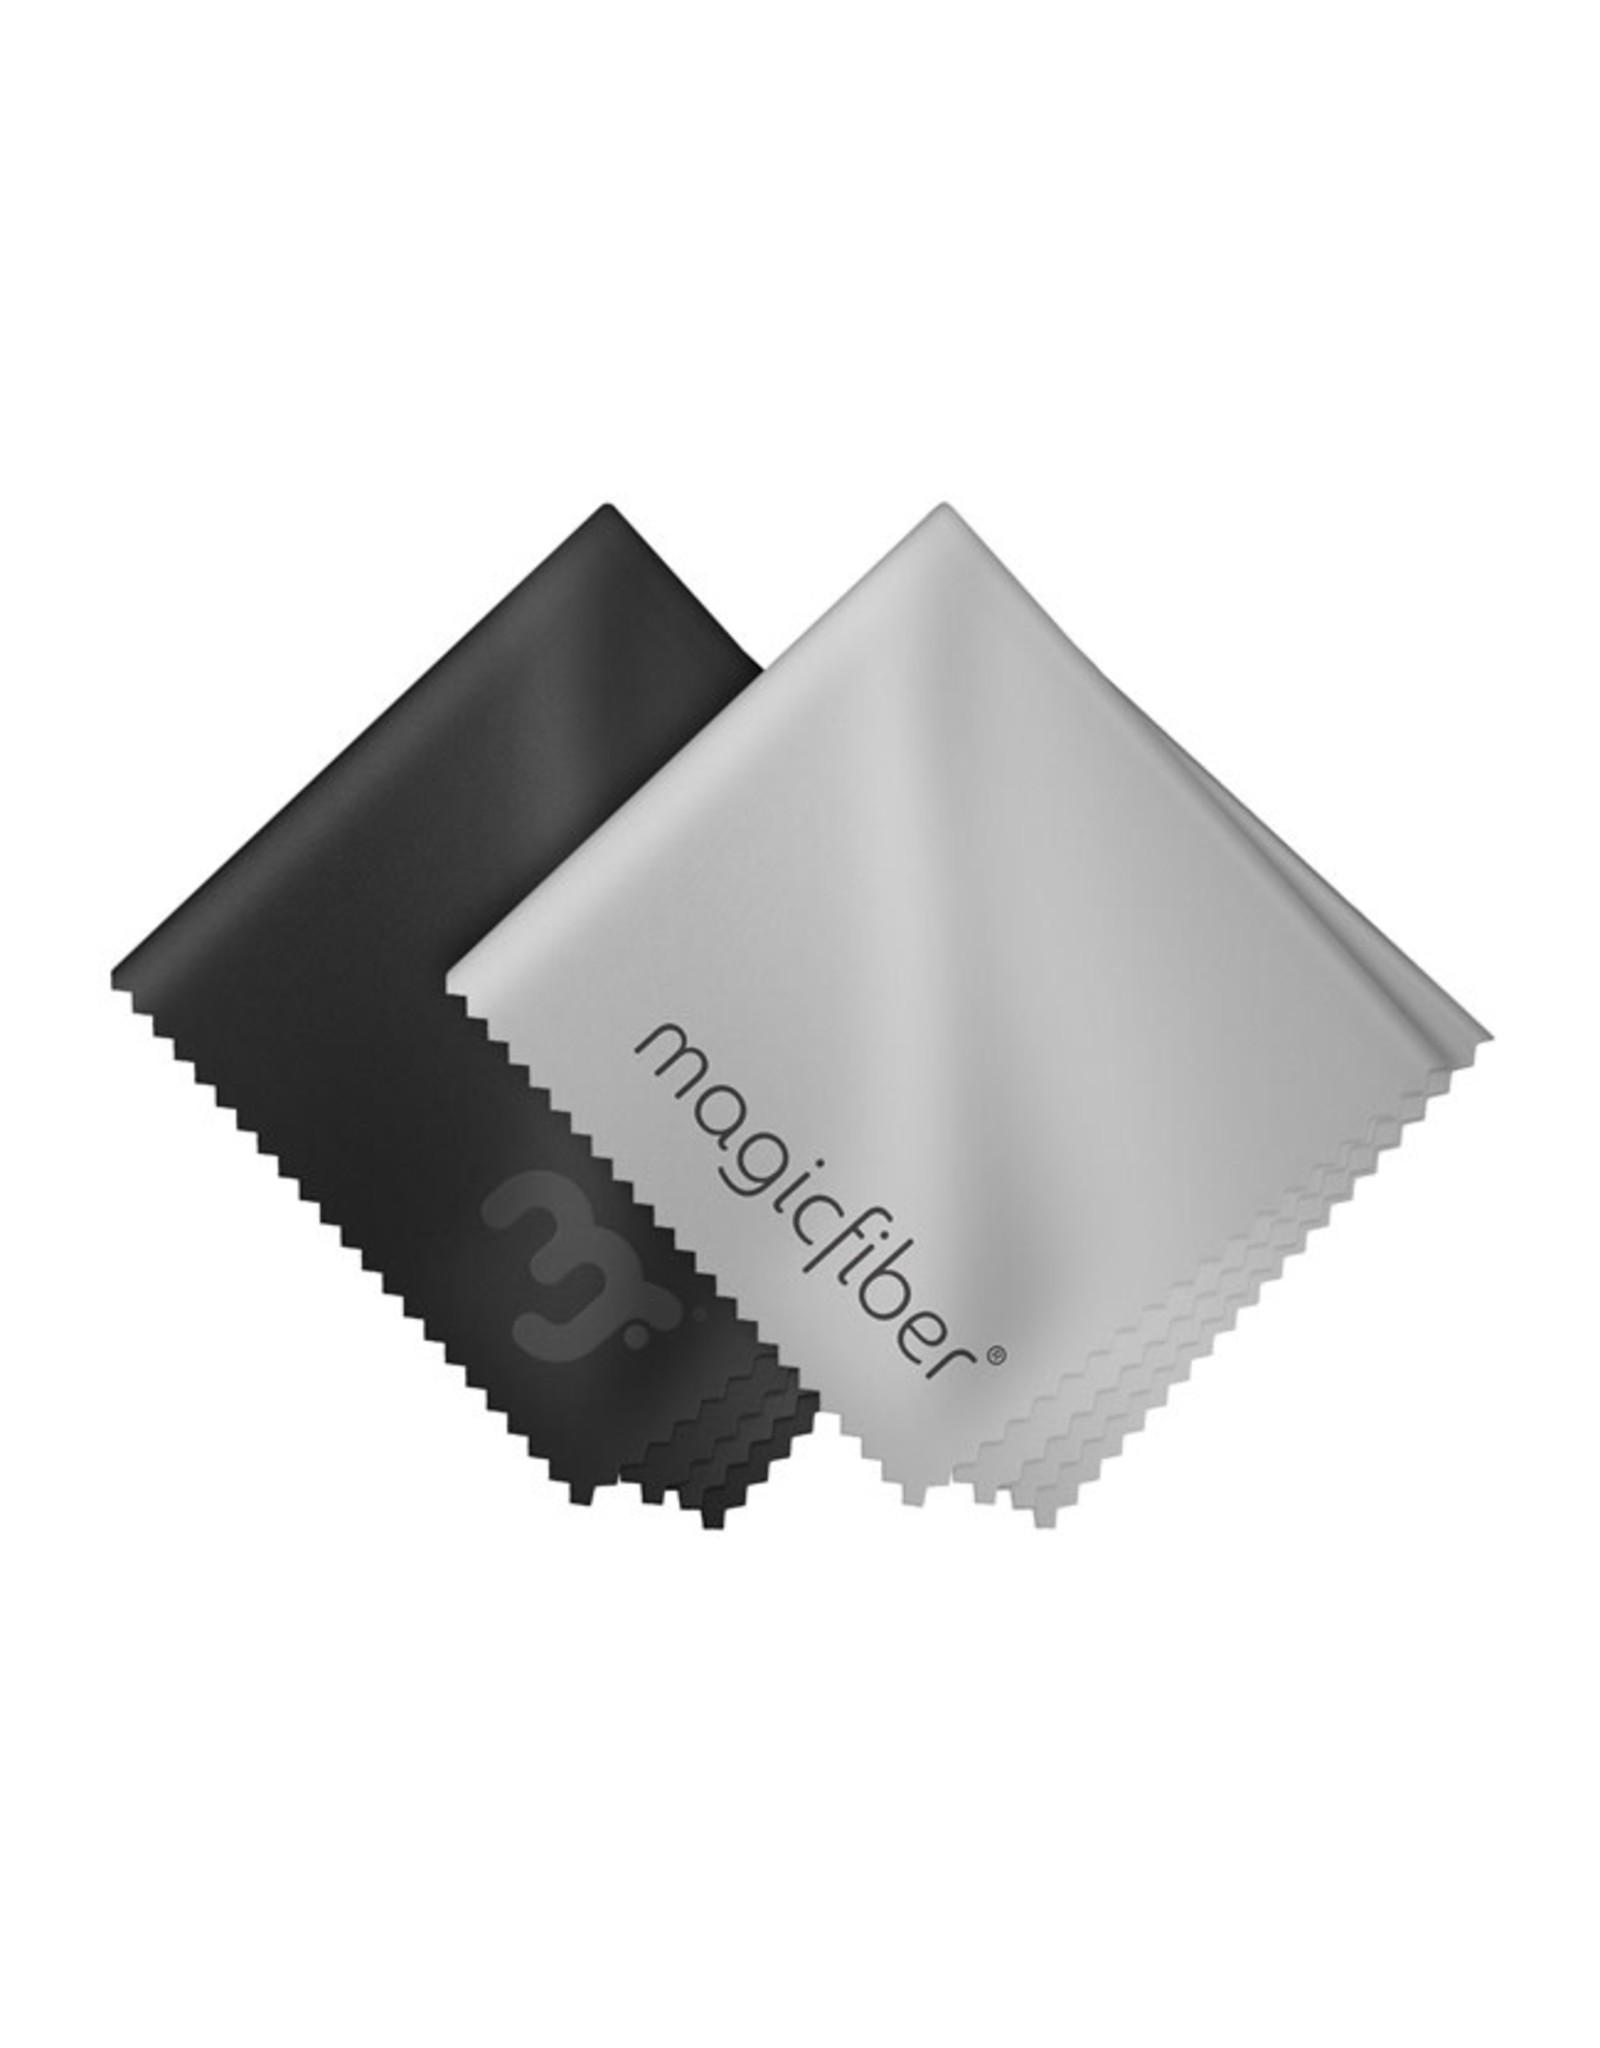 "MagicFiber MagicFiber Microfiber 6x7"" Cleaning Cloth"